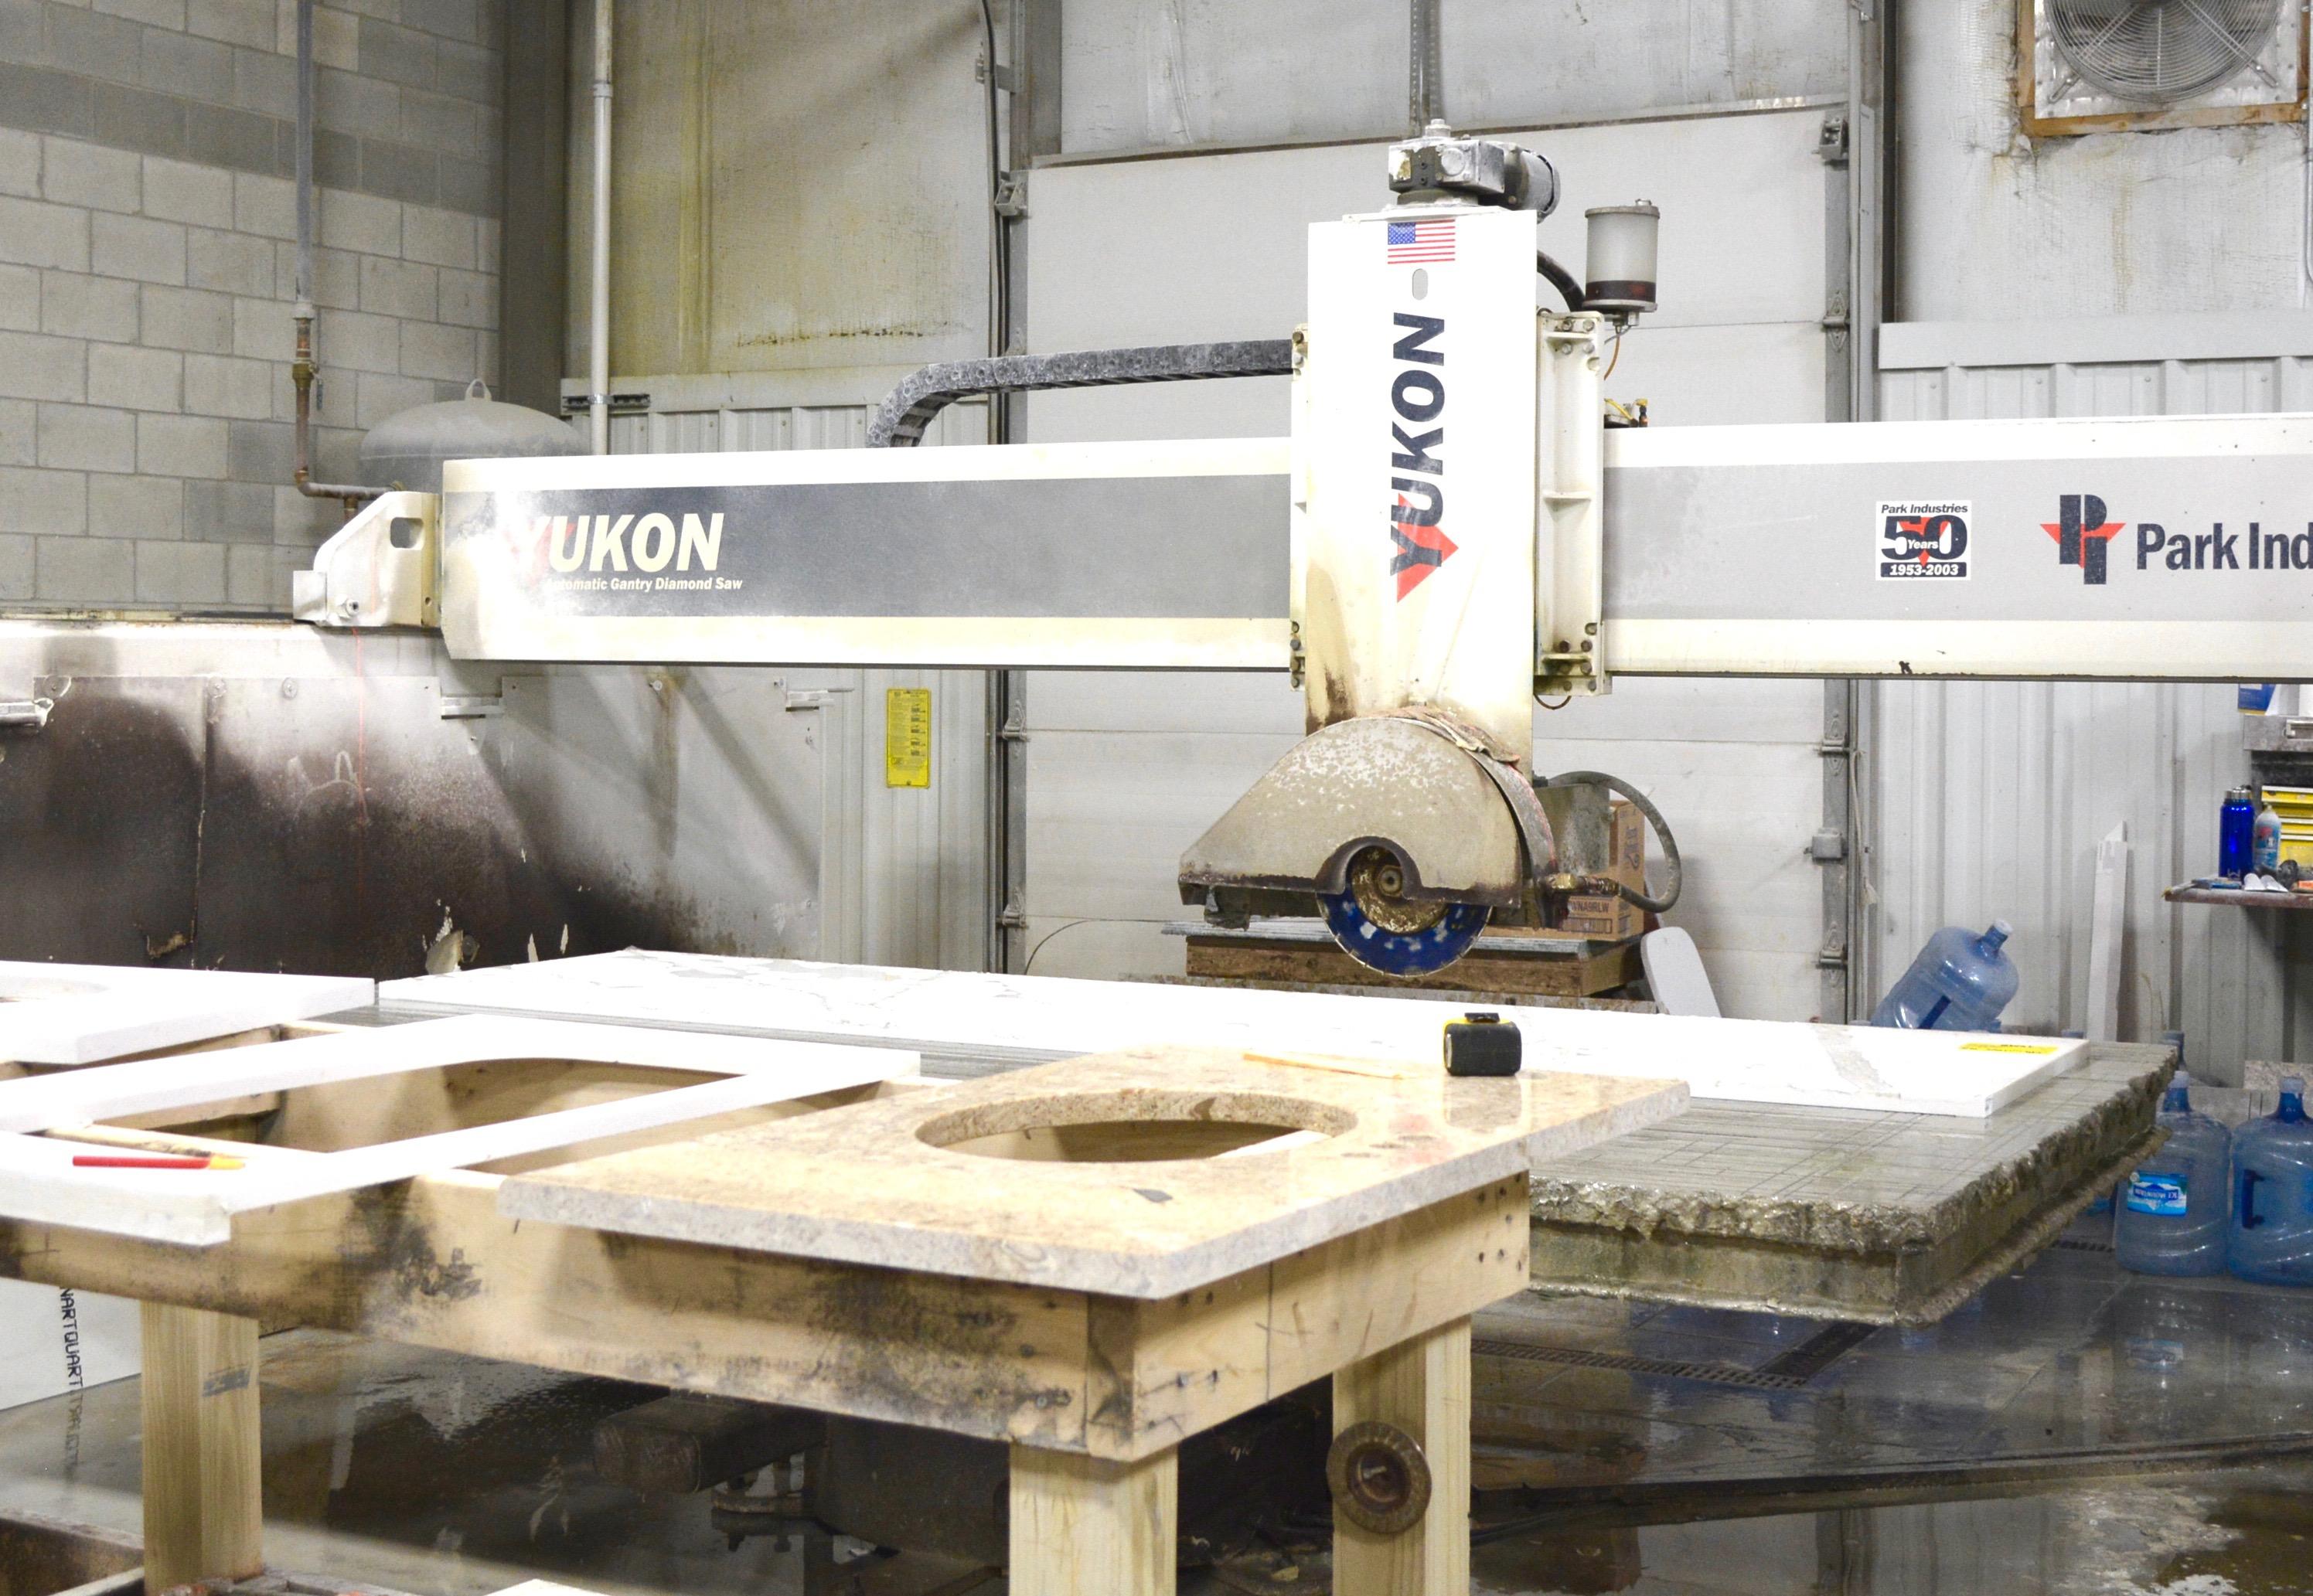 Yukon Stone Cutter